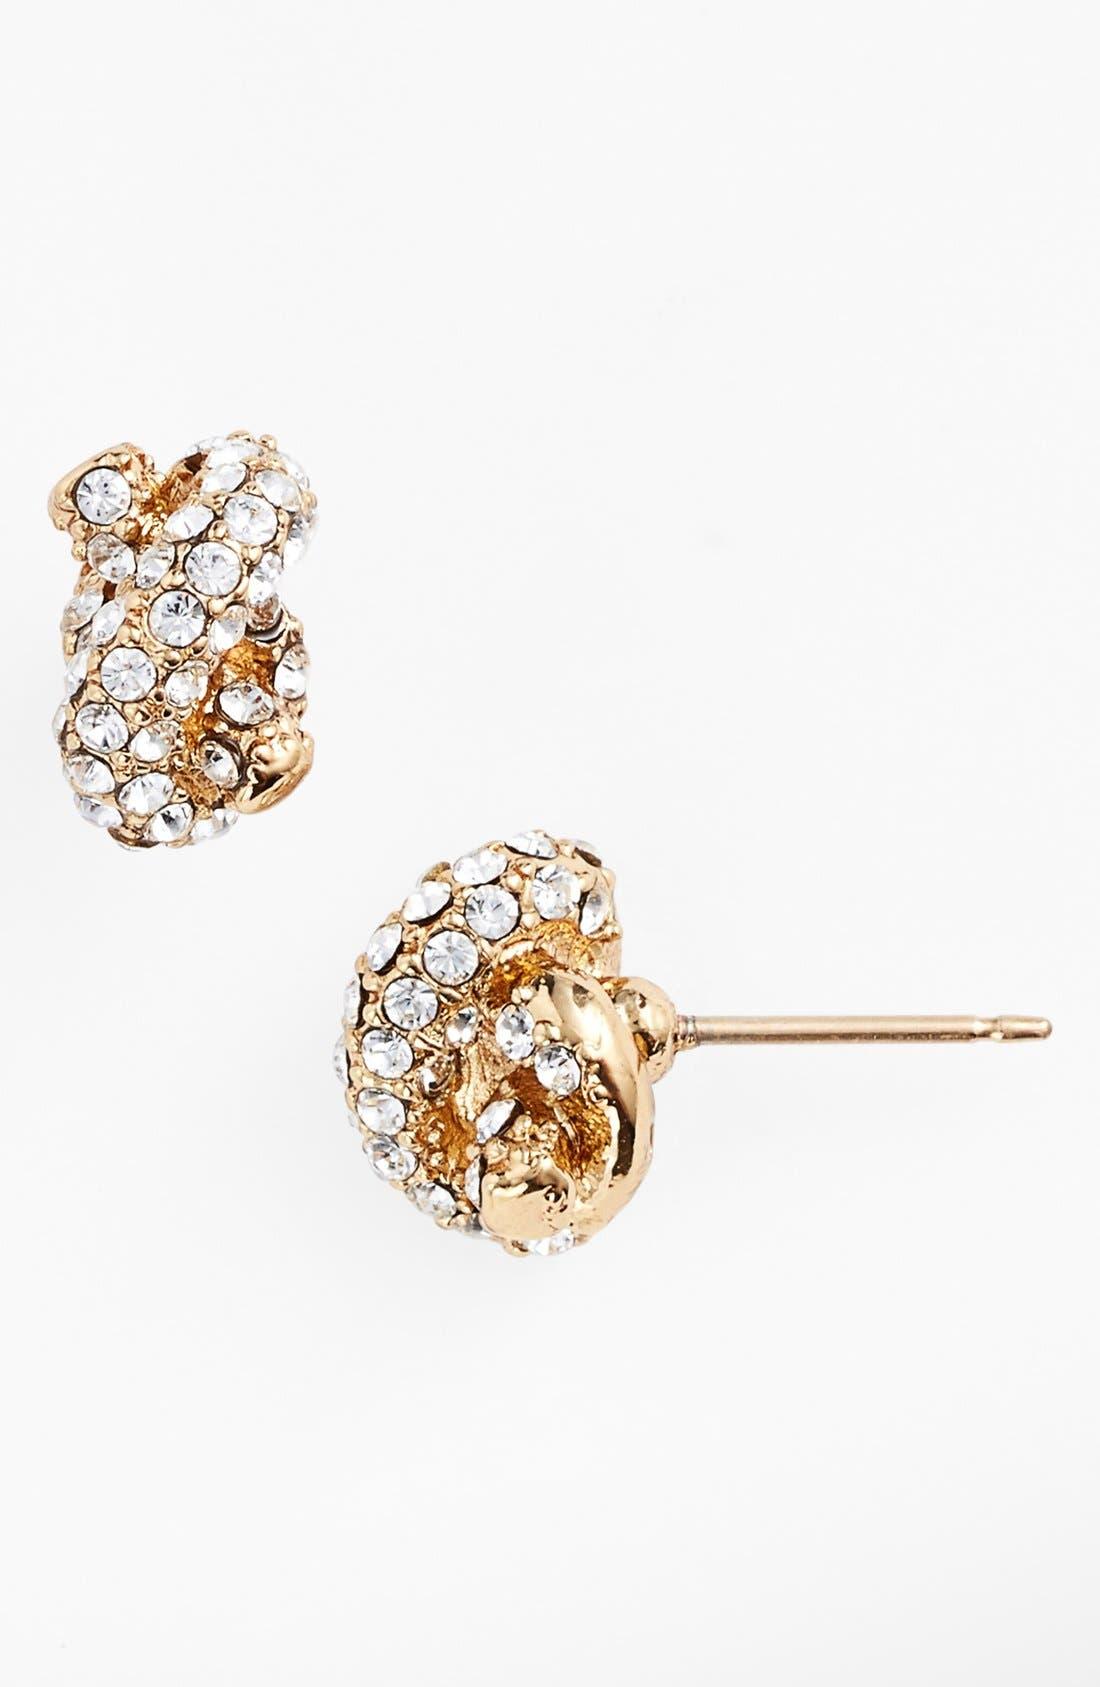 Alternate Image 1 Selected - kate spade new york 'sailors' knot' stud earrings